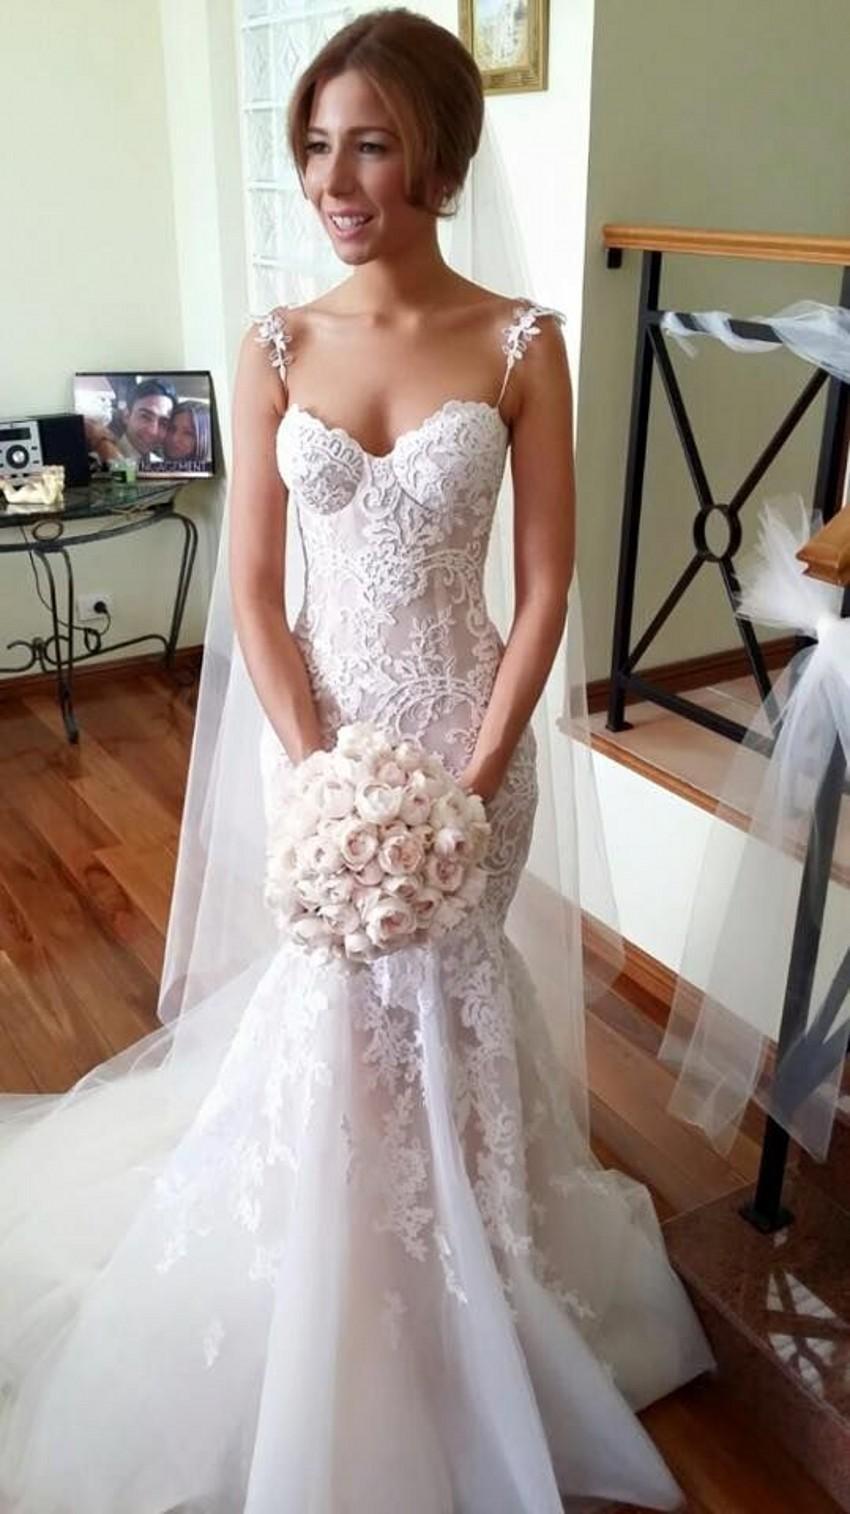 Spaghetti Strap Wedding Dresses  Long Applique Sleeveless Mermaid Spaghetti Strap Tulle